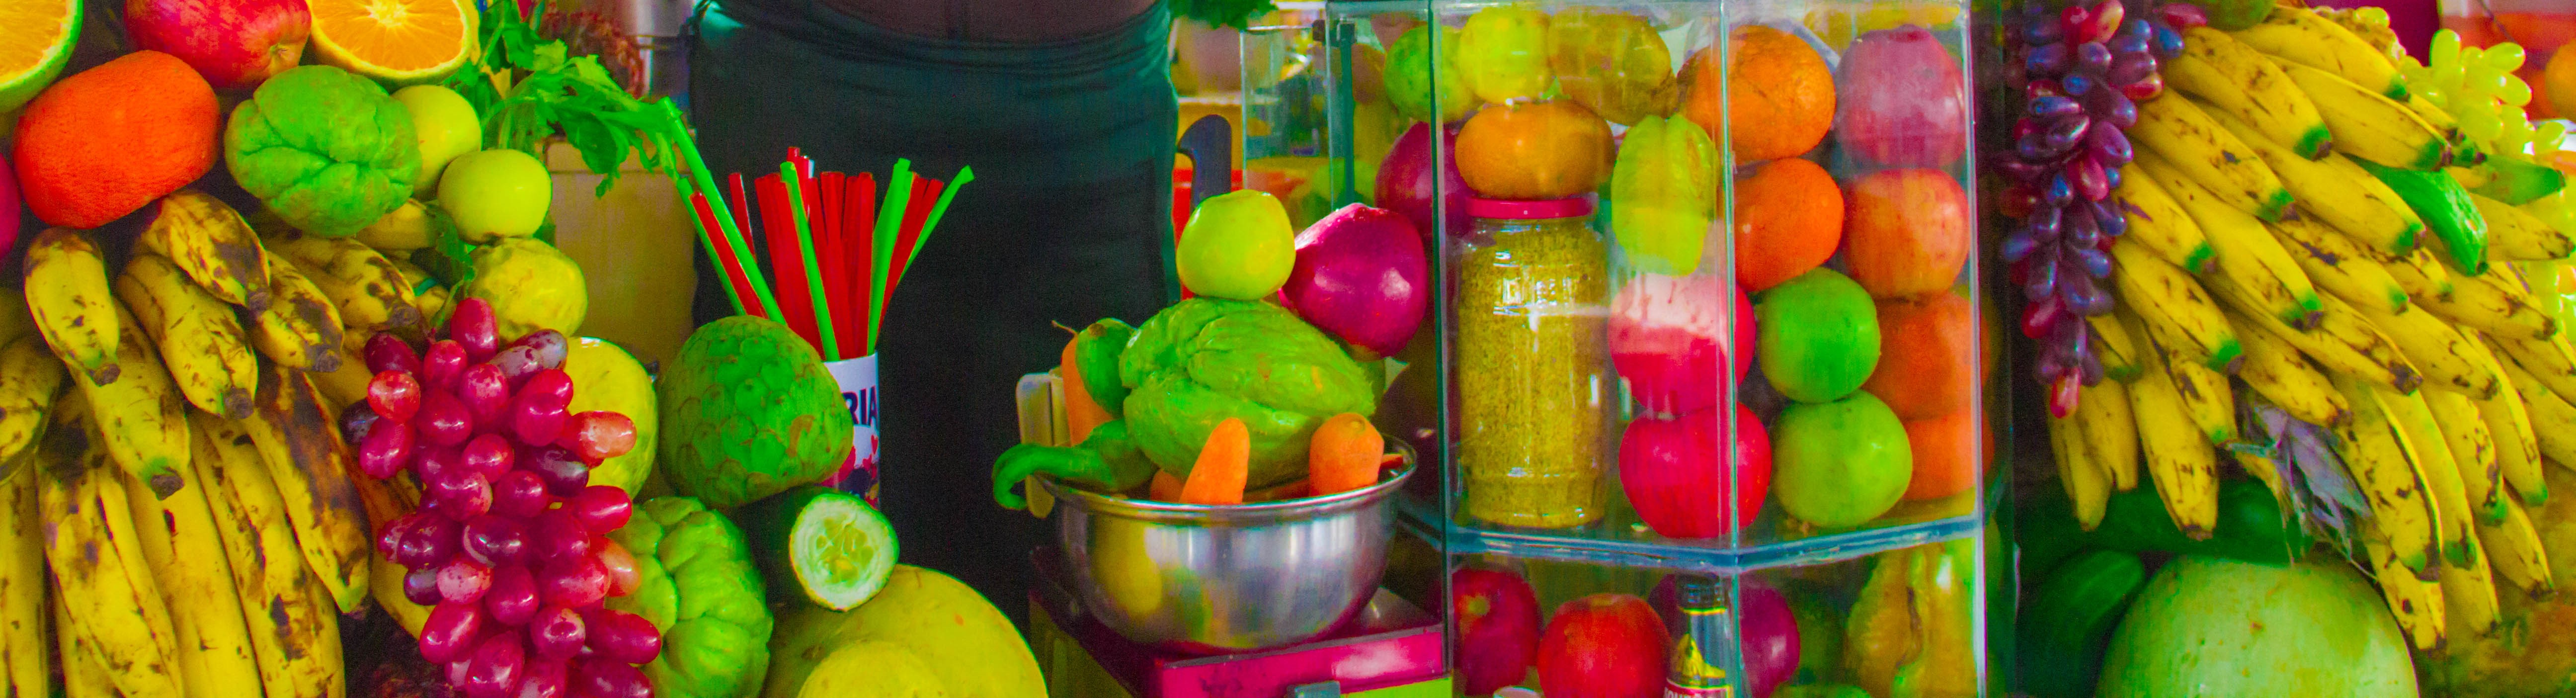 Jus-de-fruit-frais-Cusco-Photo-Dottydot.jpg?1543144535